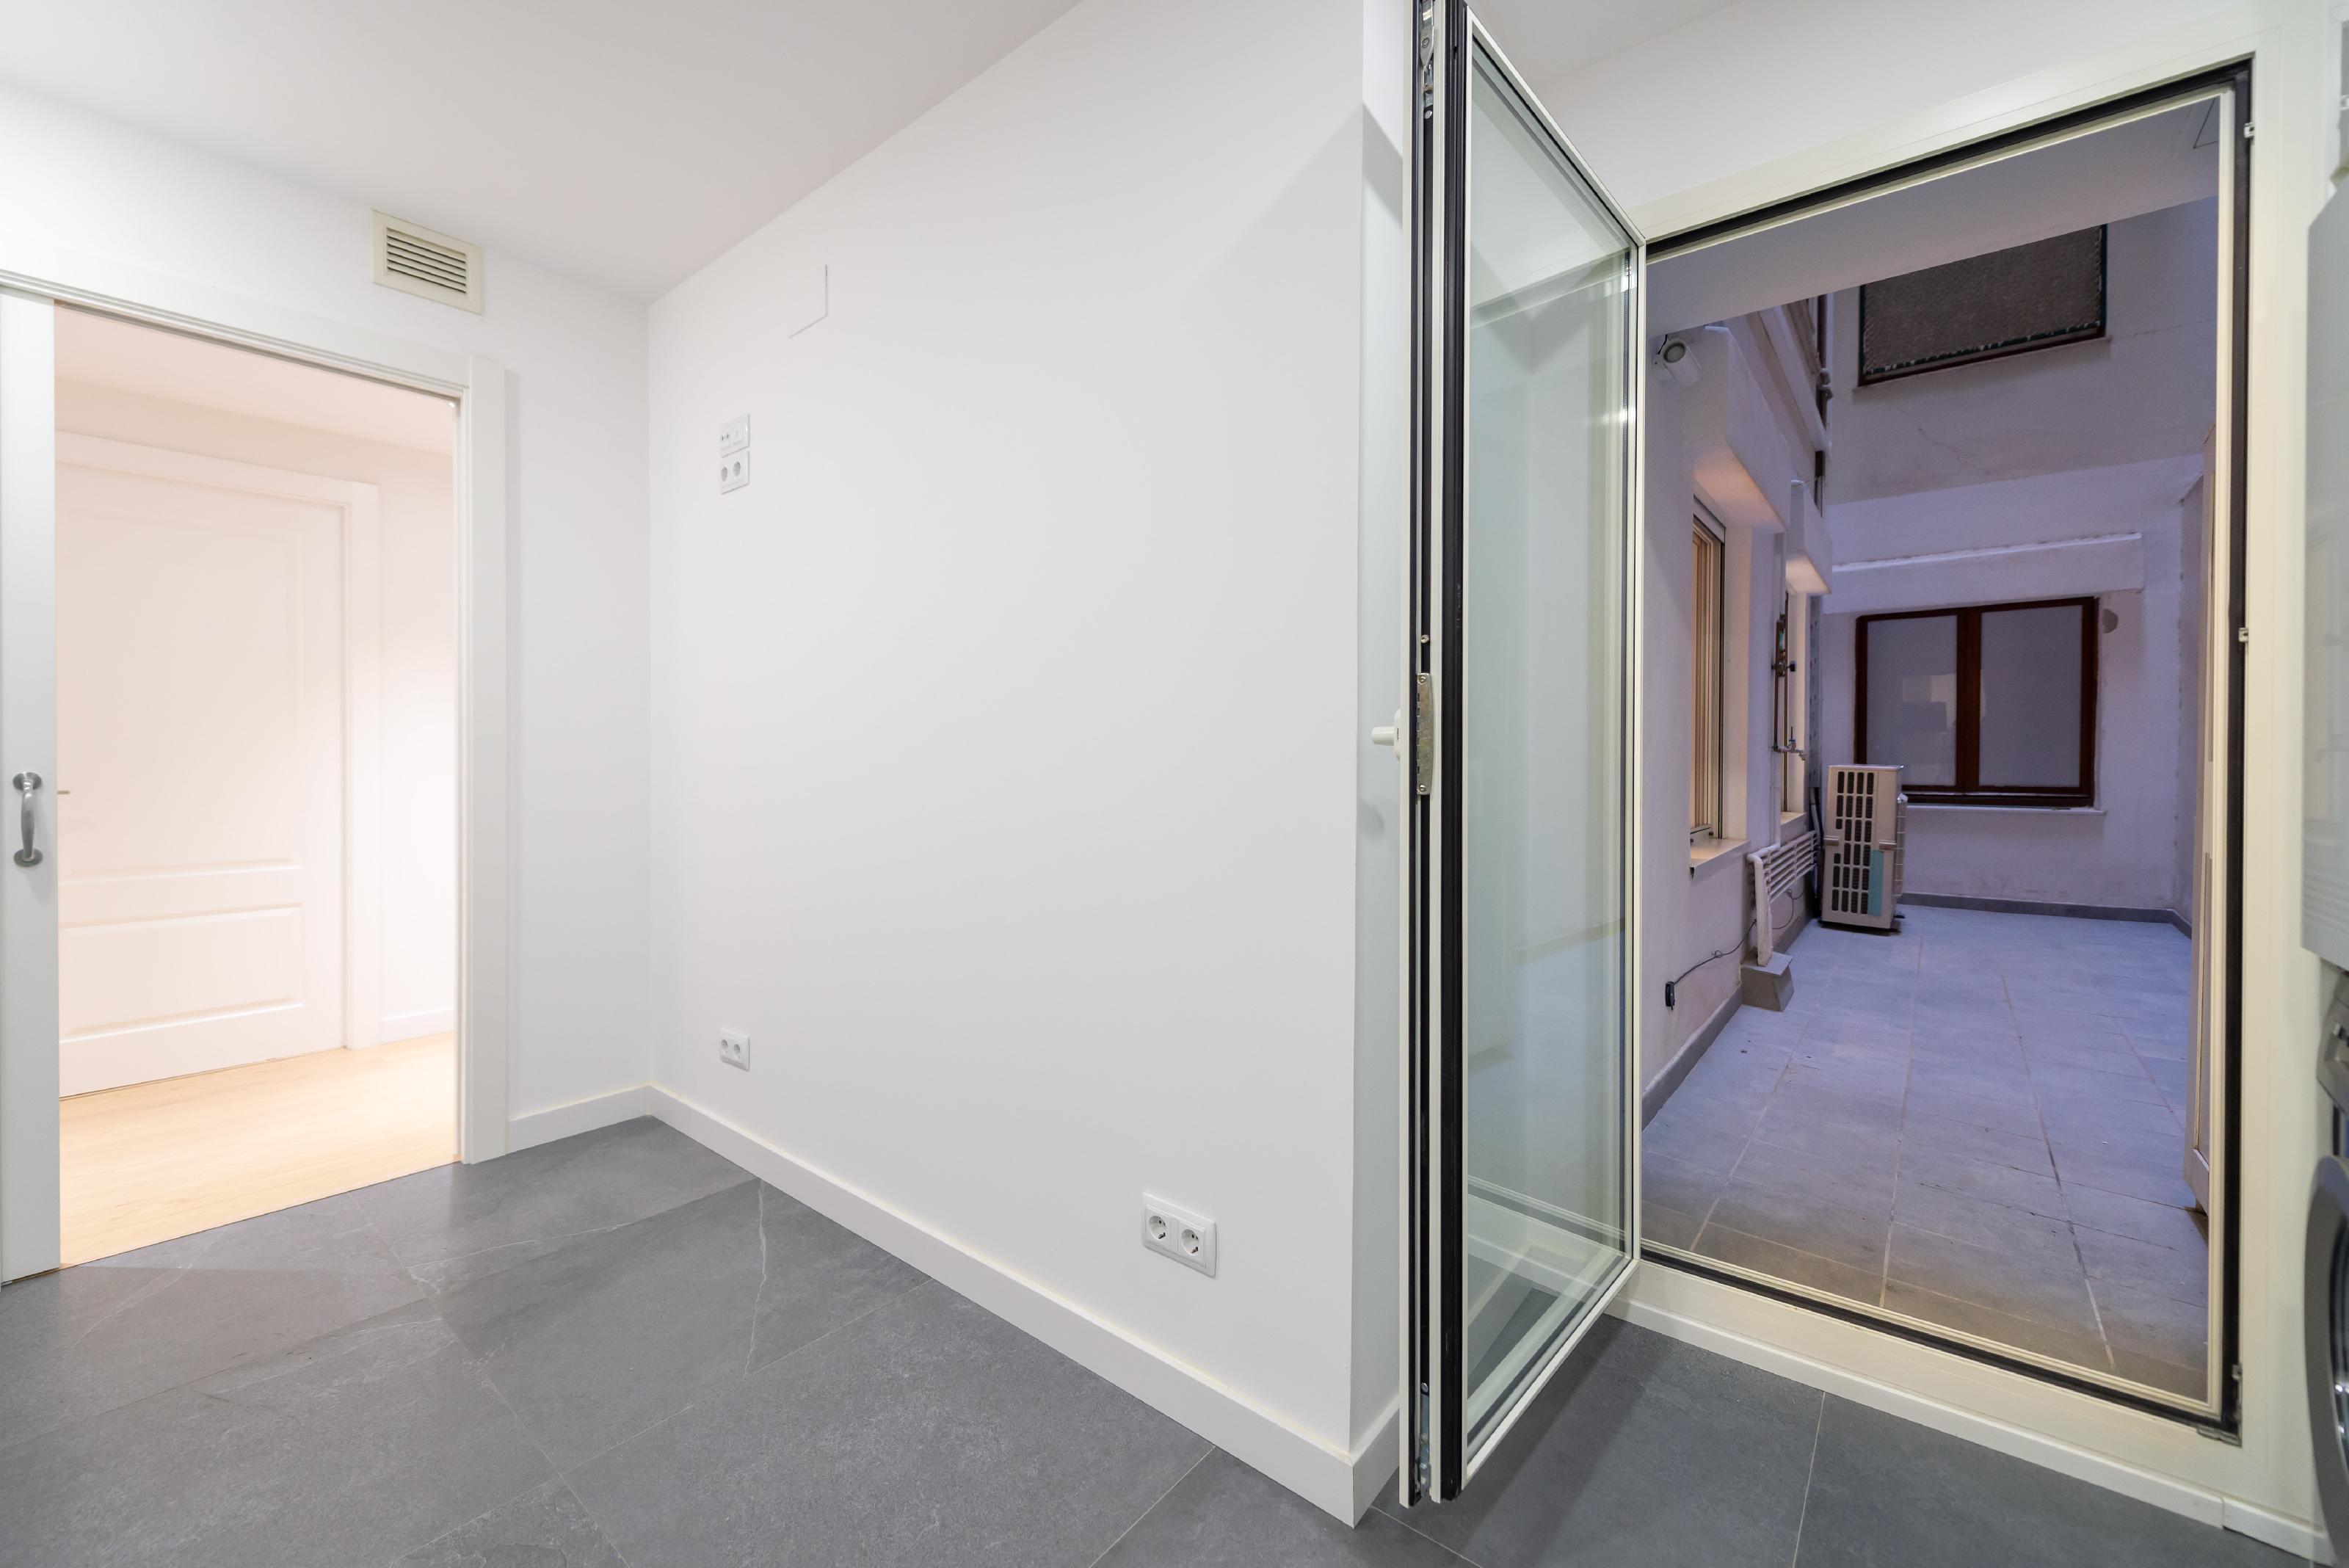 245231 Flat for sale in Sarrià-Sant Gervasi, Sant Gervasi-Galvany 21